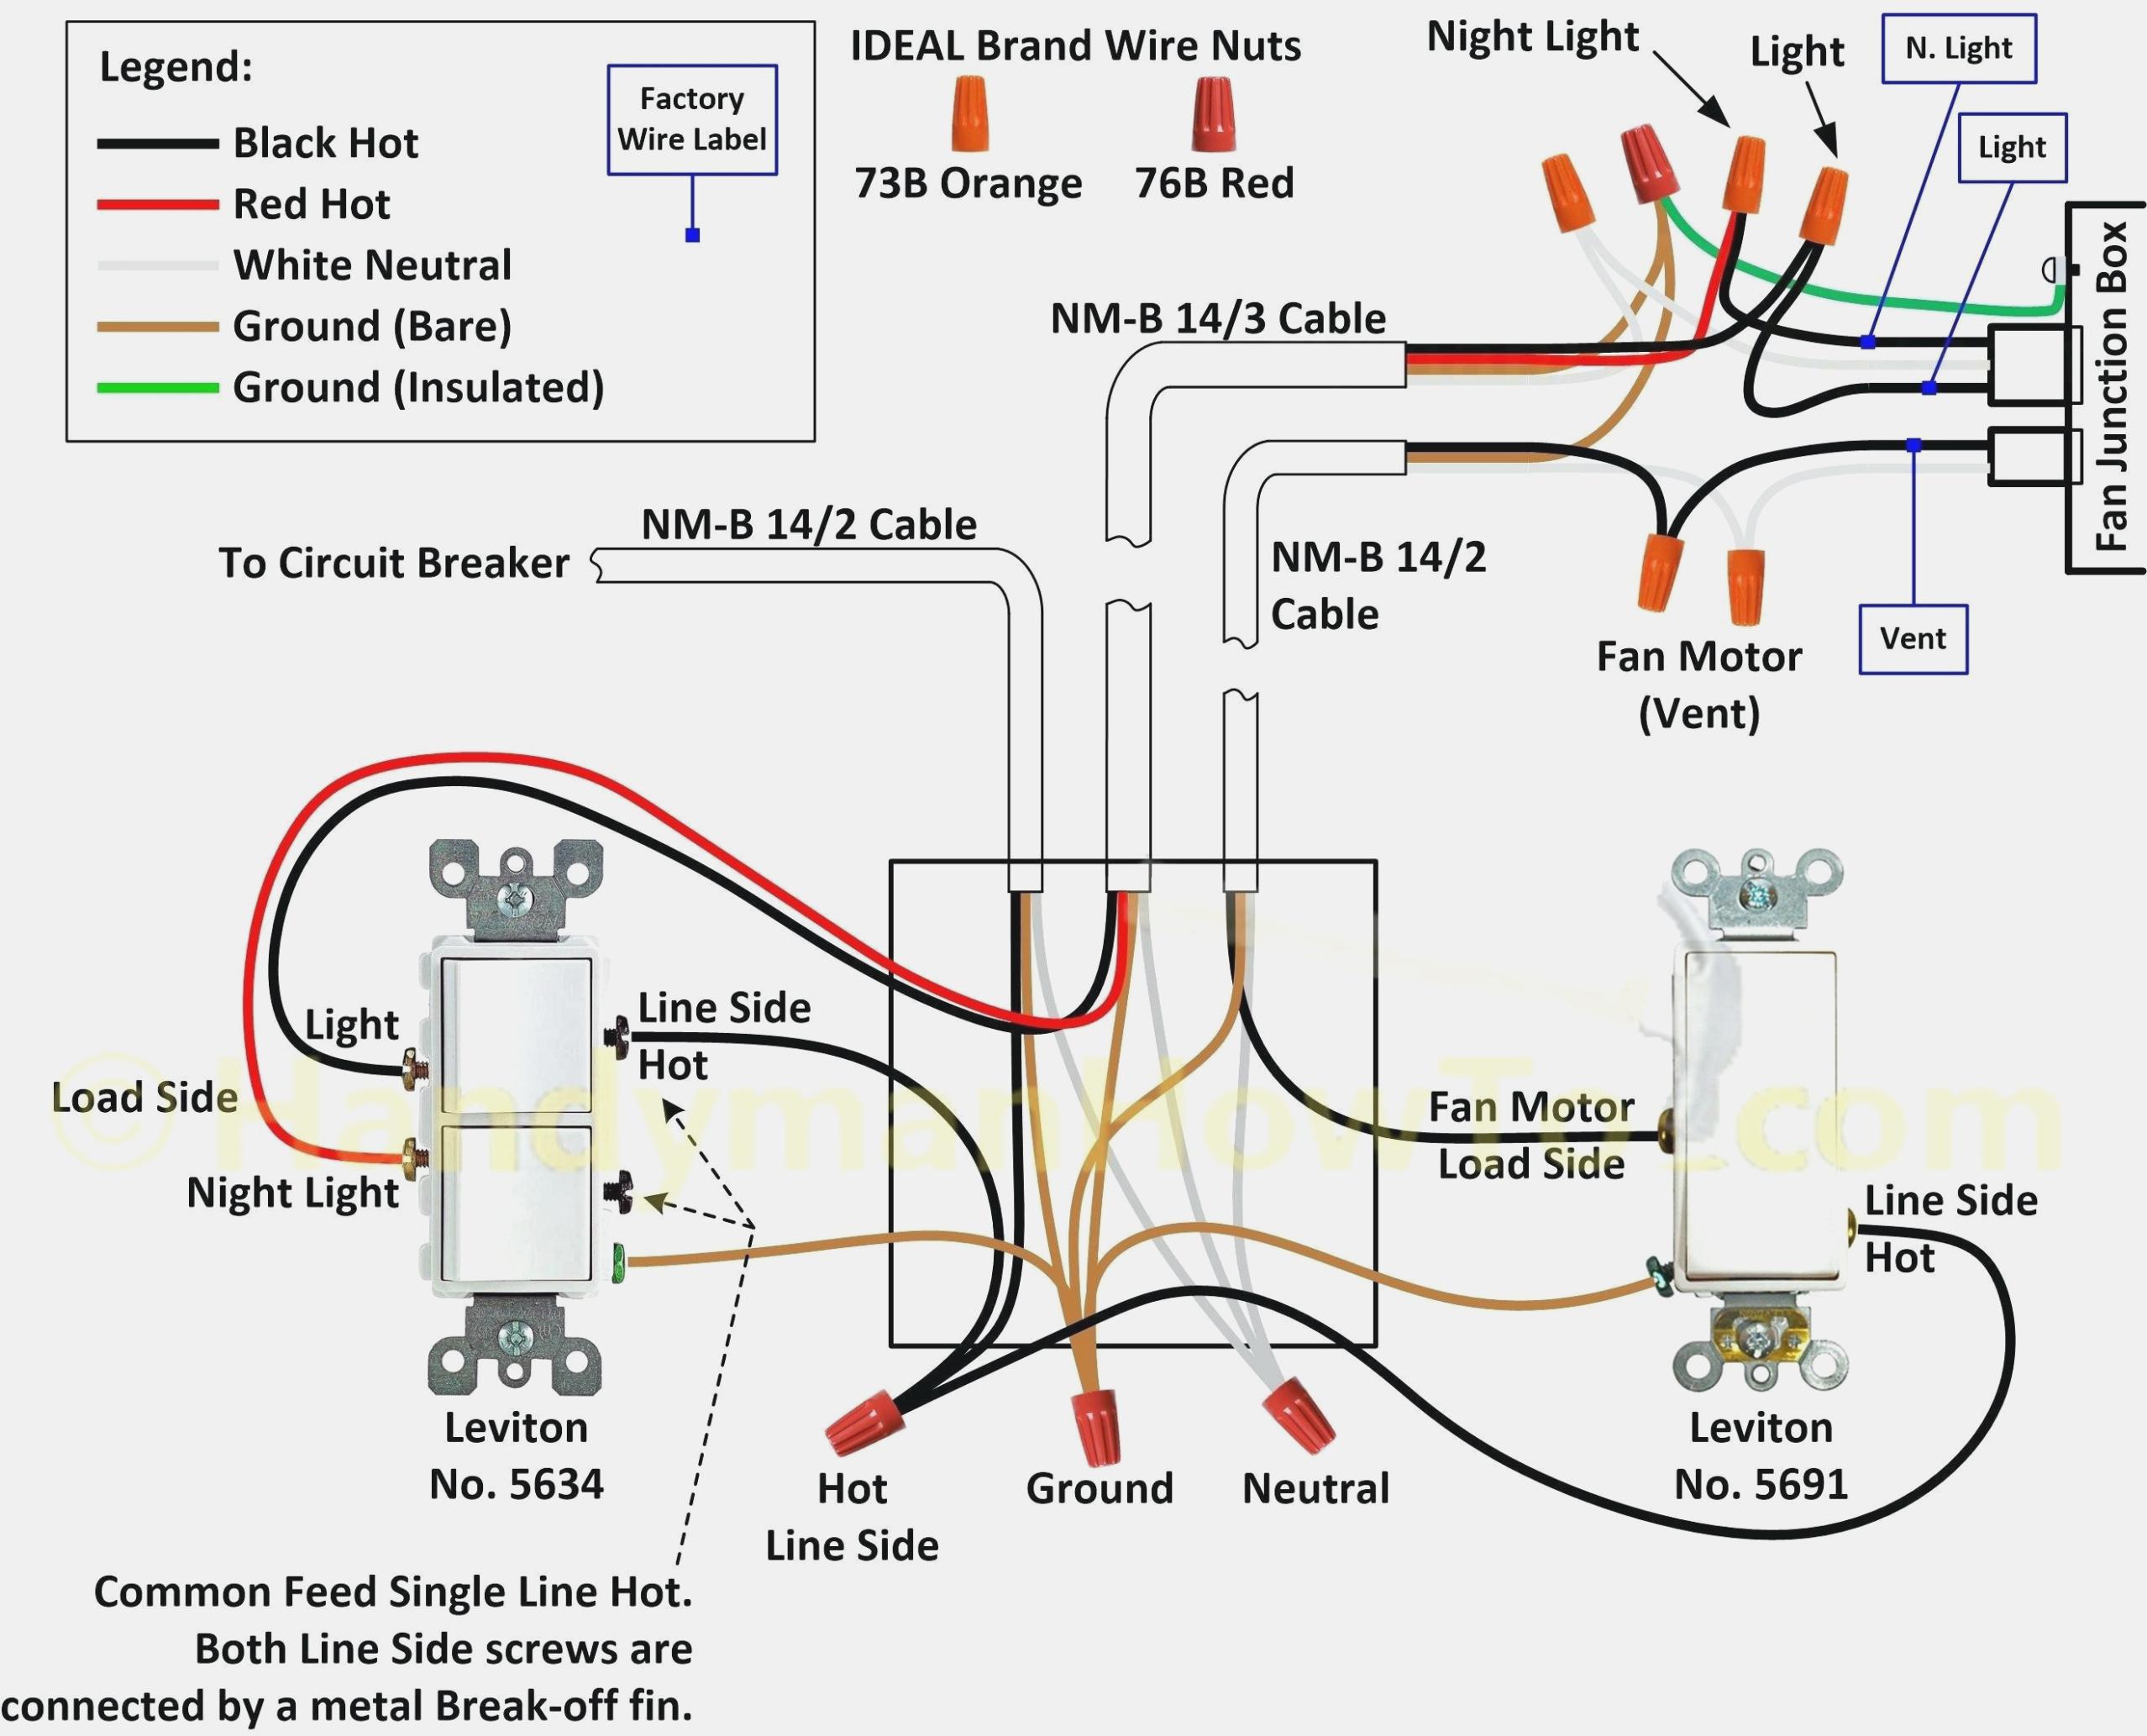 Graphix Lutron Wiring Diagram - Wiring Diagram Name - Lutron 3 Way Dimmer Switch Wiring Diagram